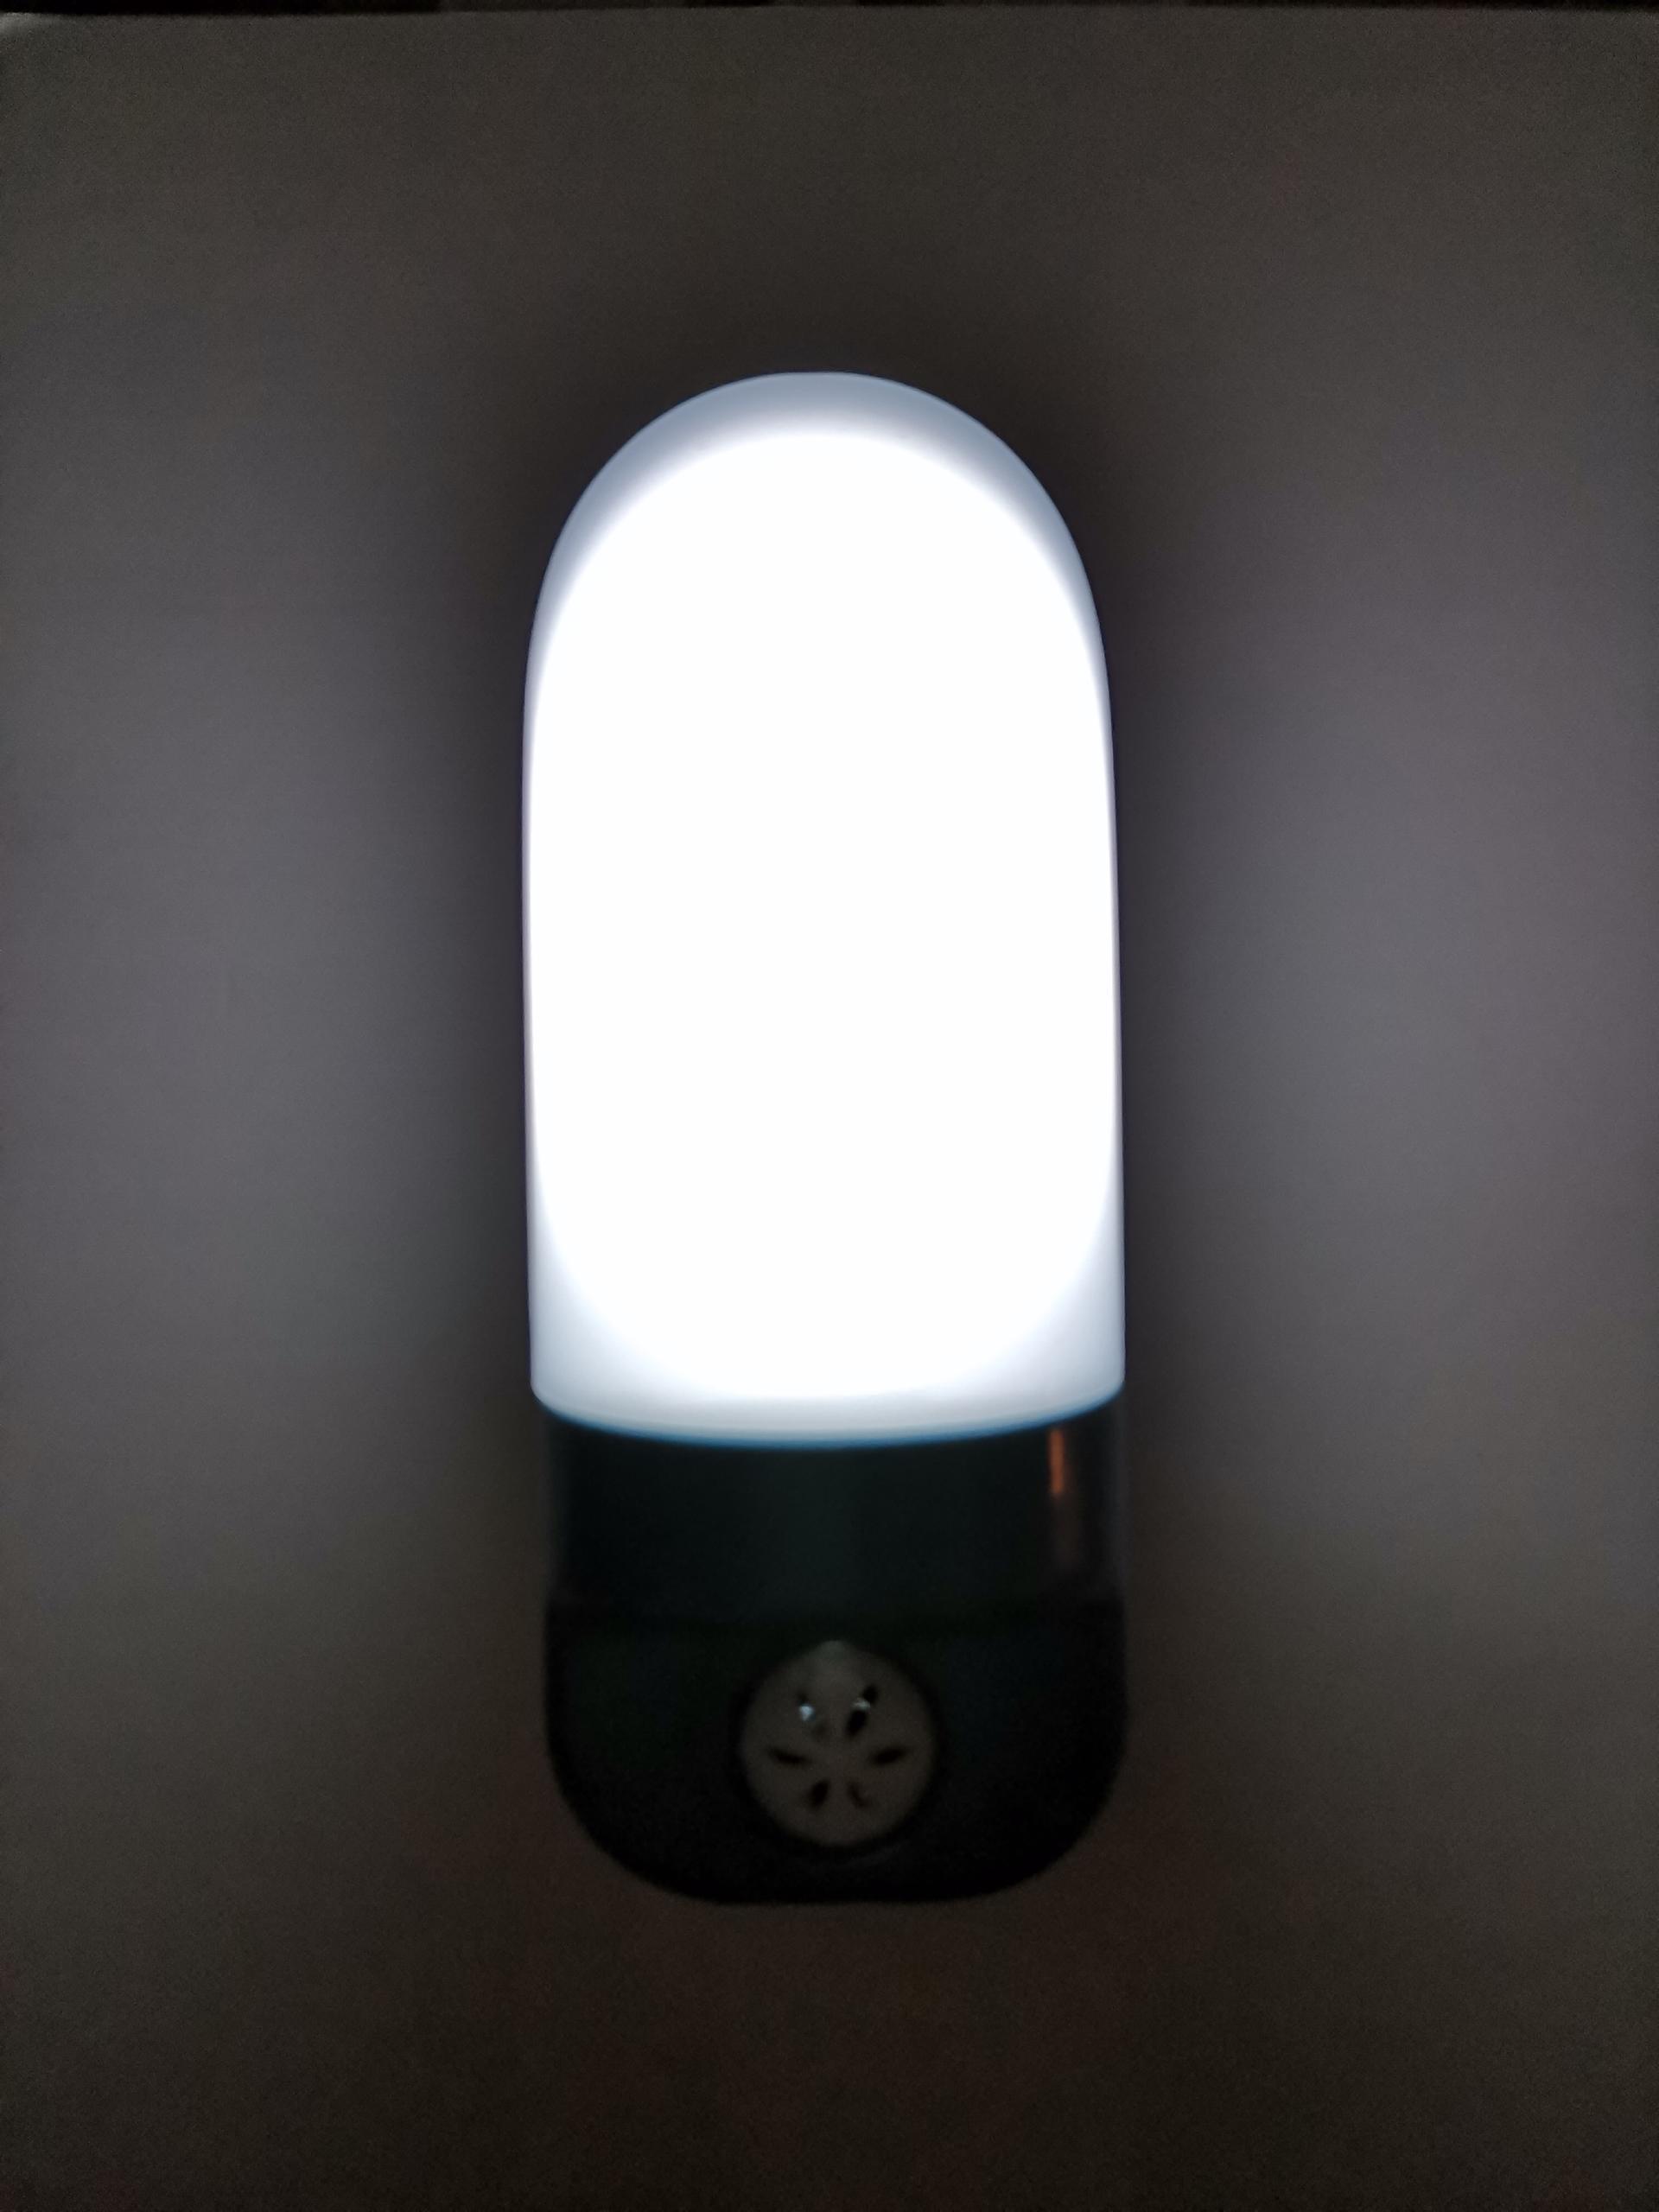 OEM A88 sensor control EU UK SAA plug in ABS material night light lamp for bedroom